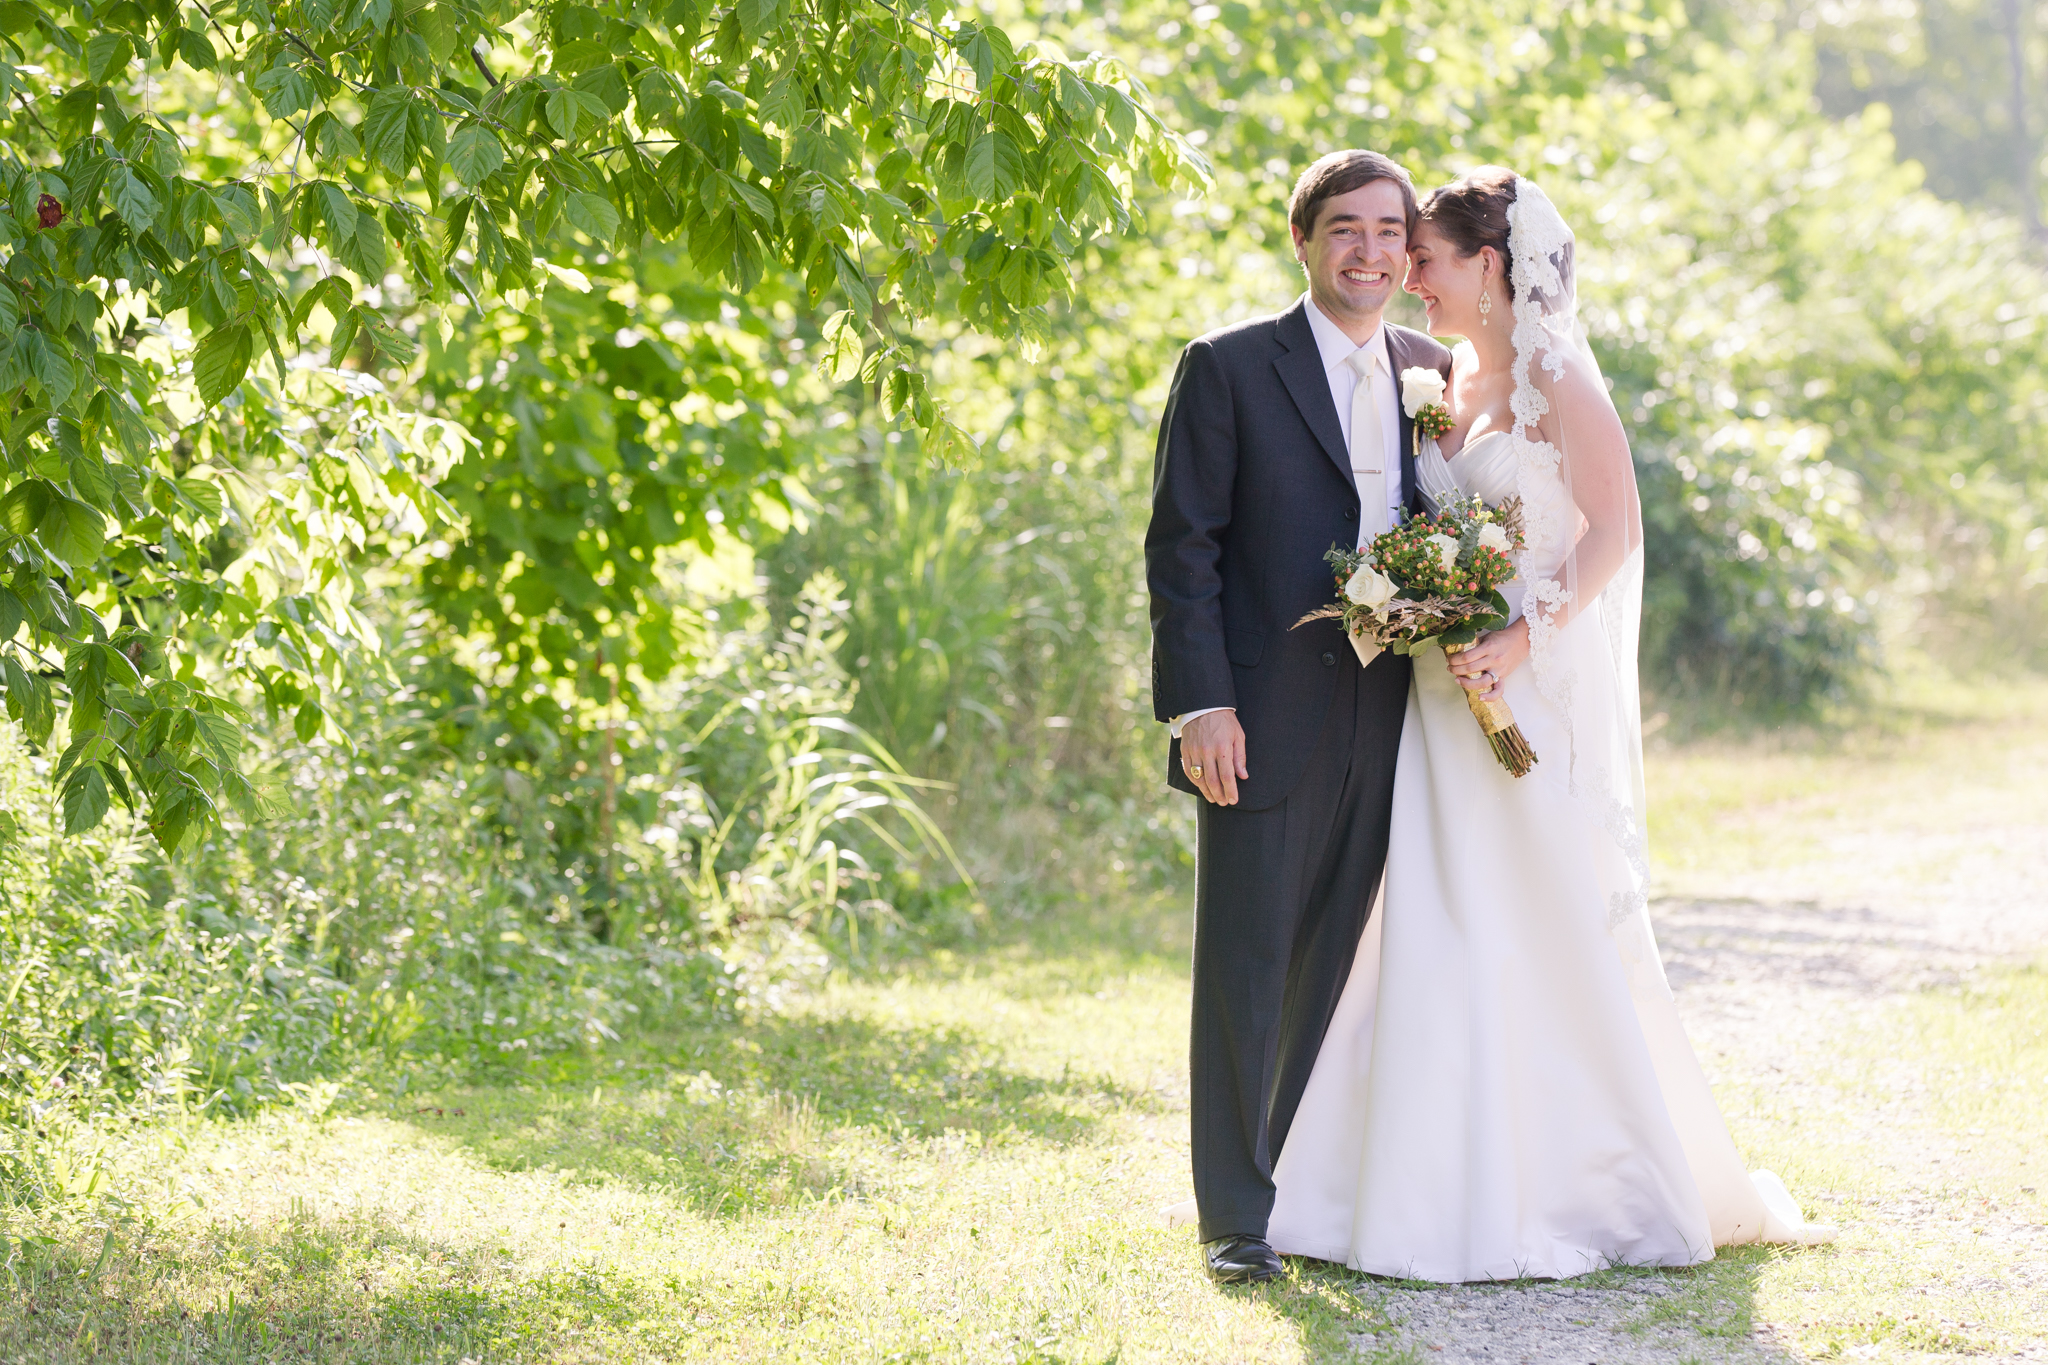 Ashley-Amber-Photo-Candid-Wedding-Photography-173444.jpg